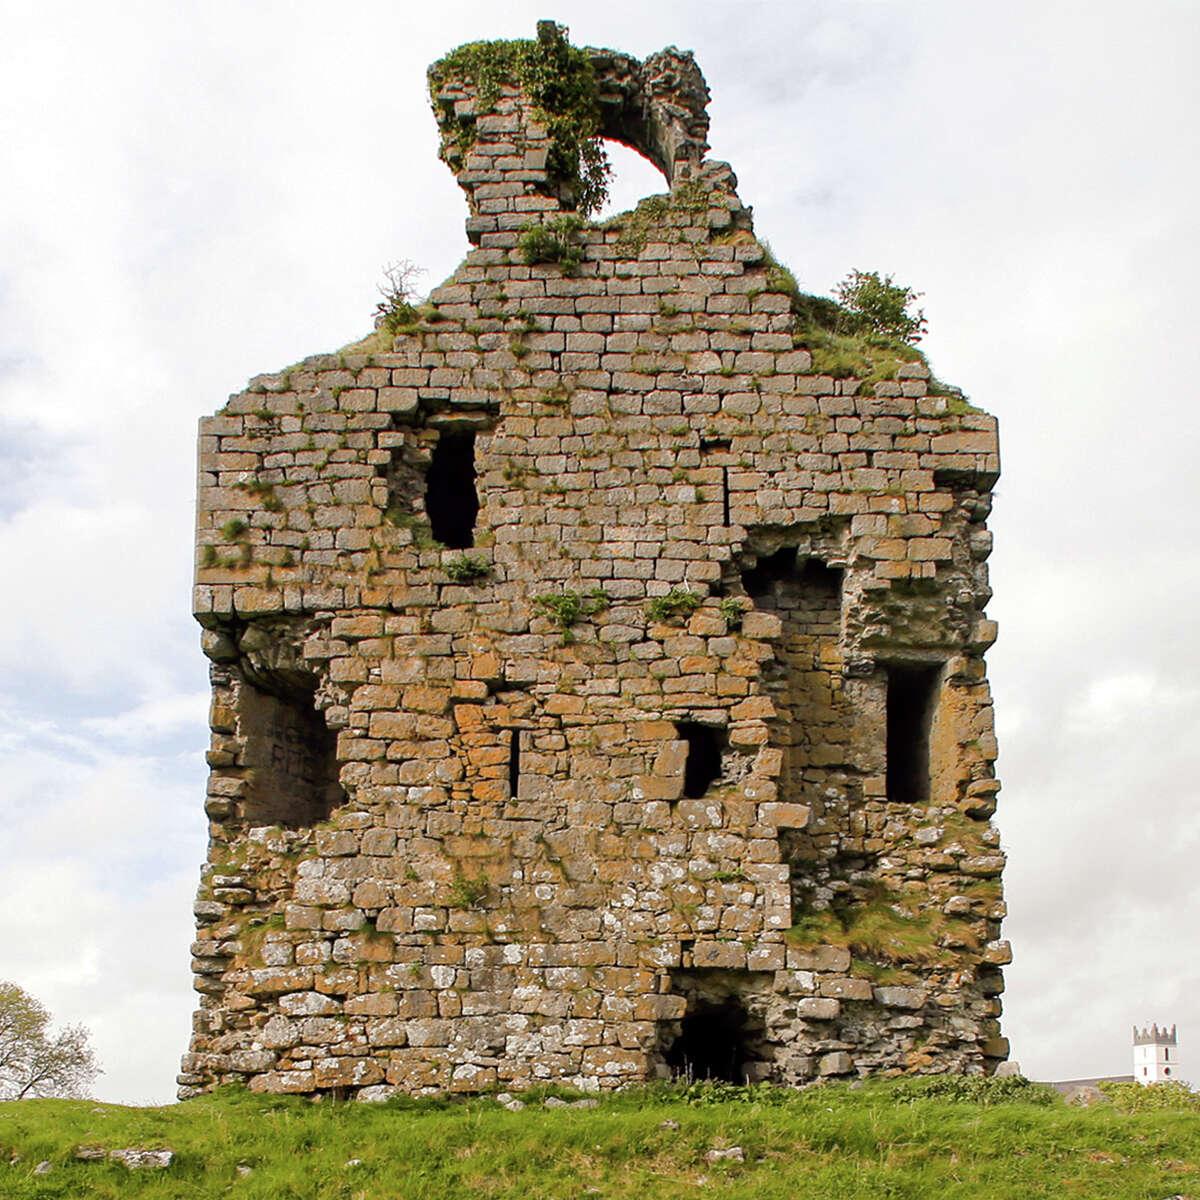 Corofin Castle now belongs to Houstonian Paul Roberts, who jokes that he needs to address 500 years of deferred maintenance.